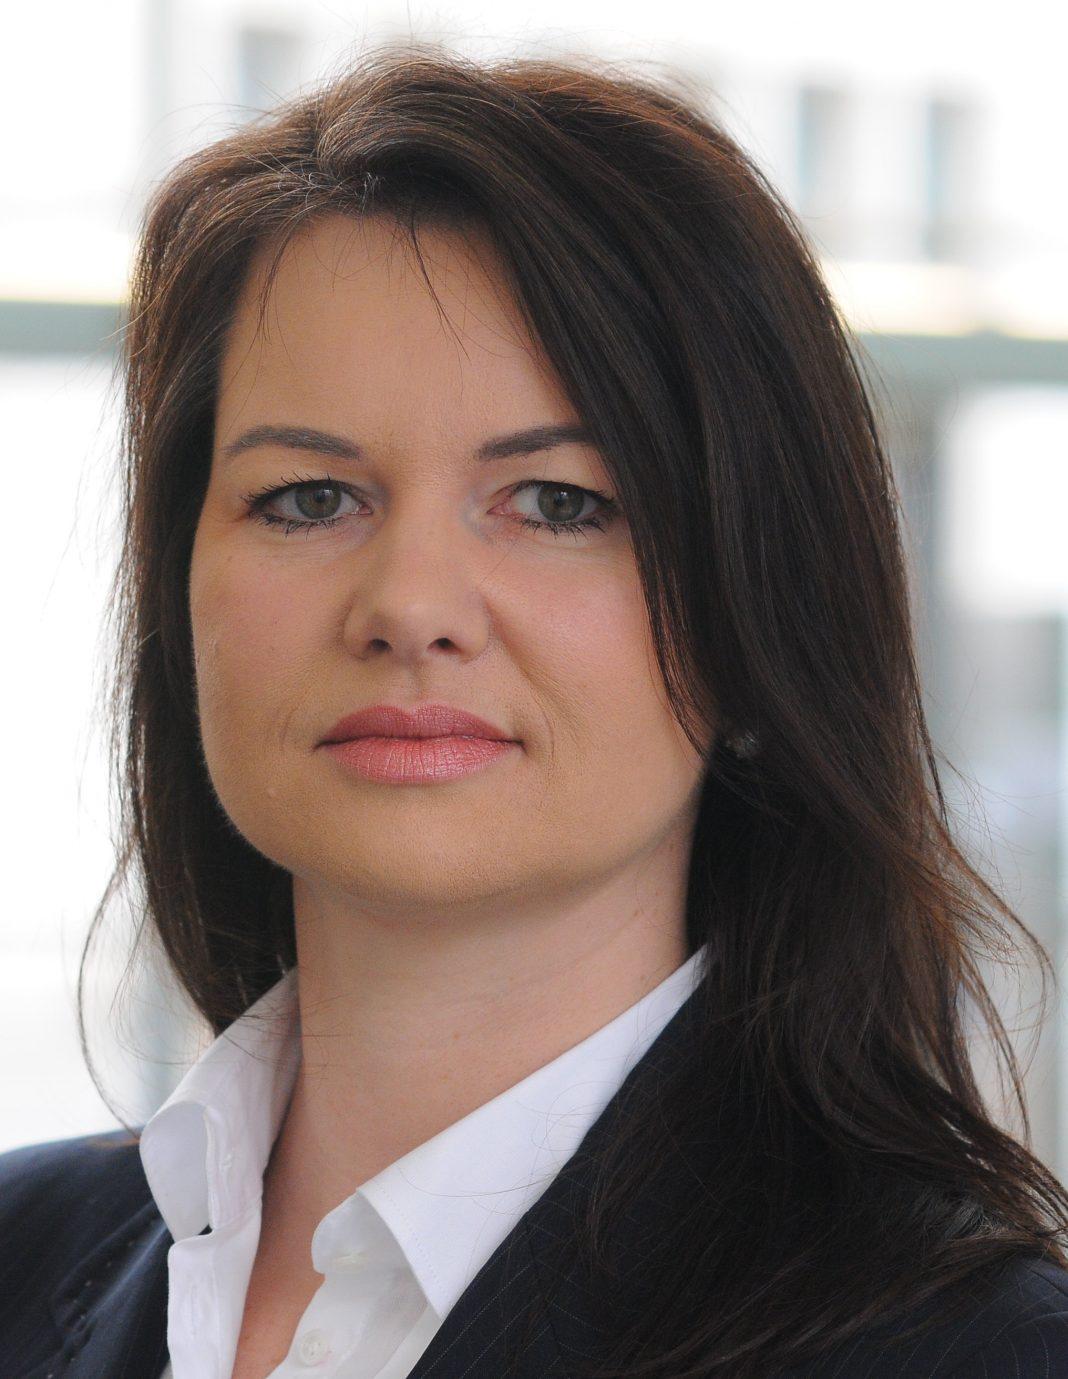 Tanja Dreilich, Constantia Flexibles Group GmbH